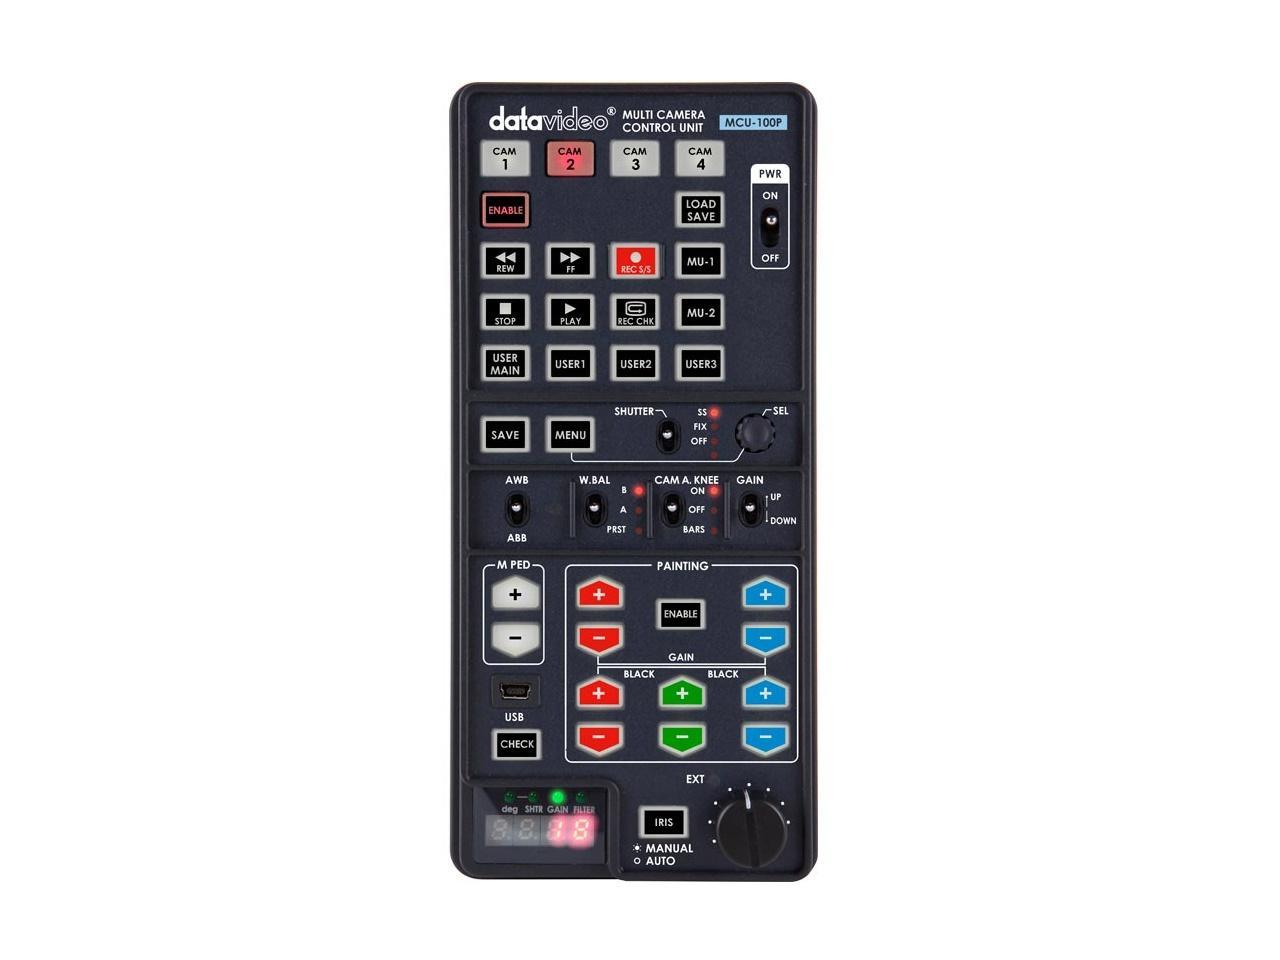 Datavideo MCU-100P Multi-Camera Control Unit - Panasonic